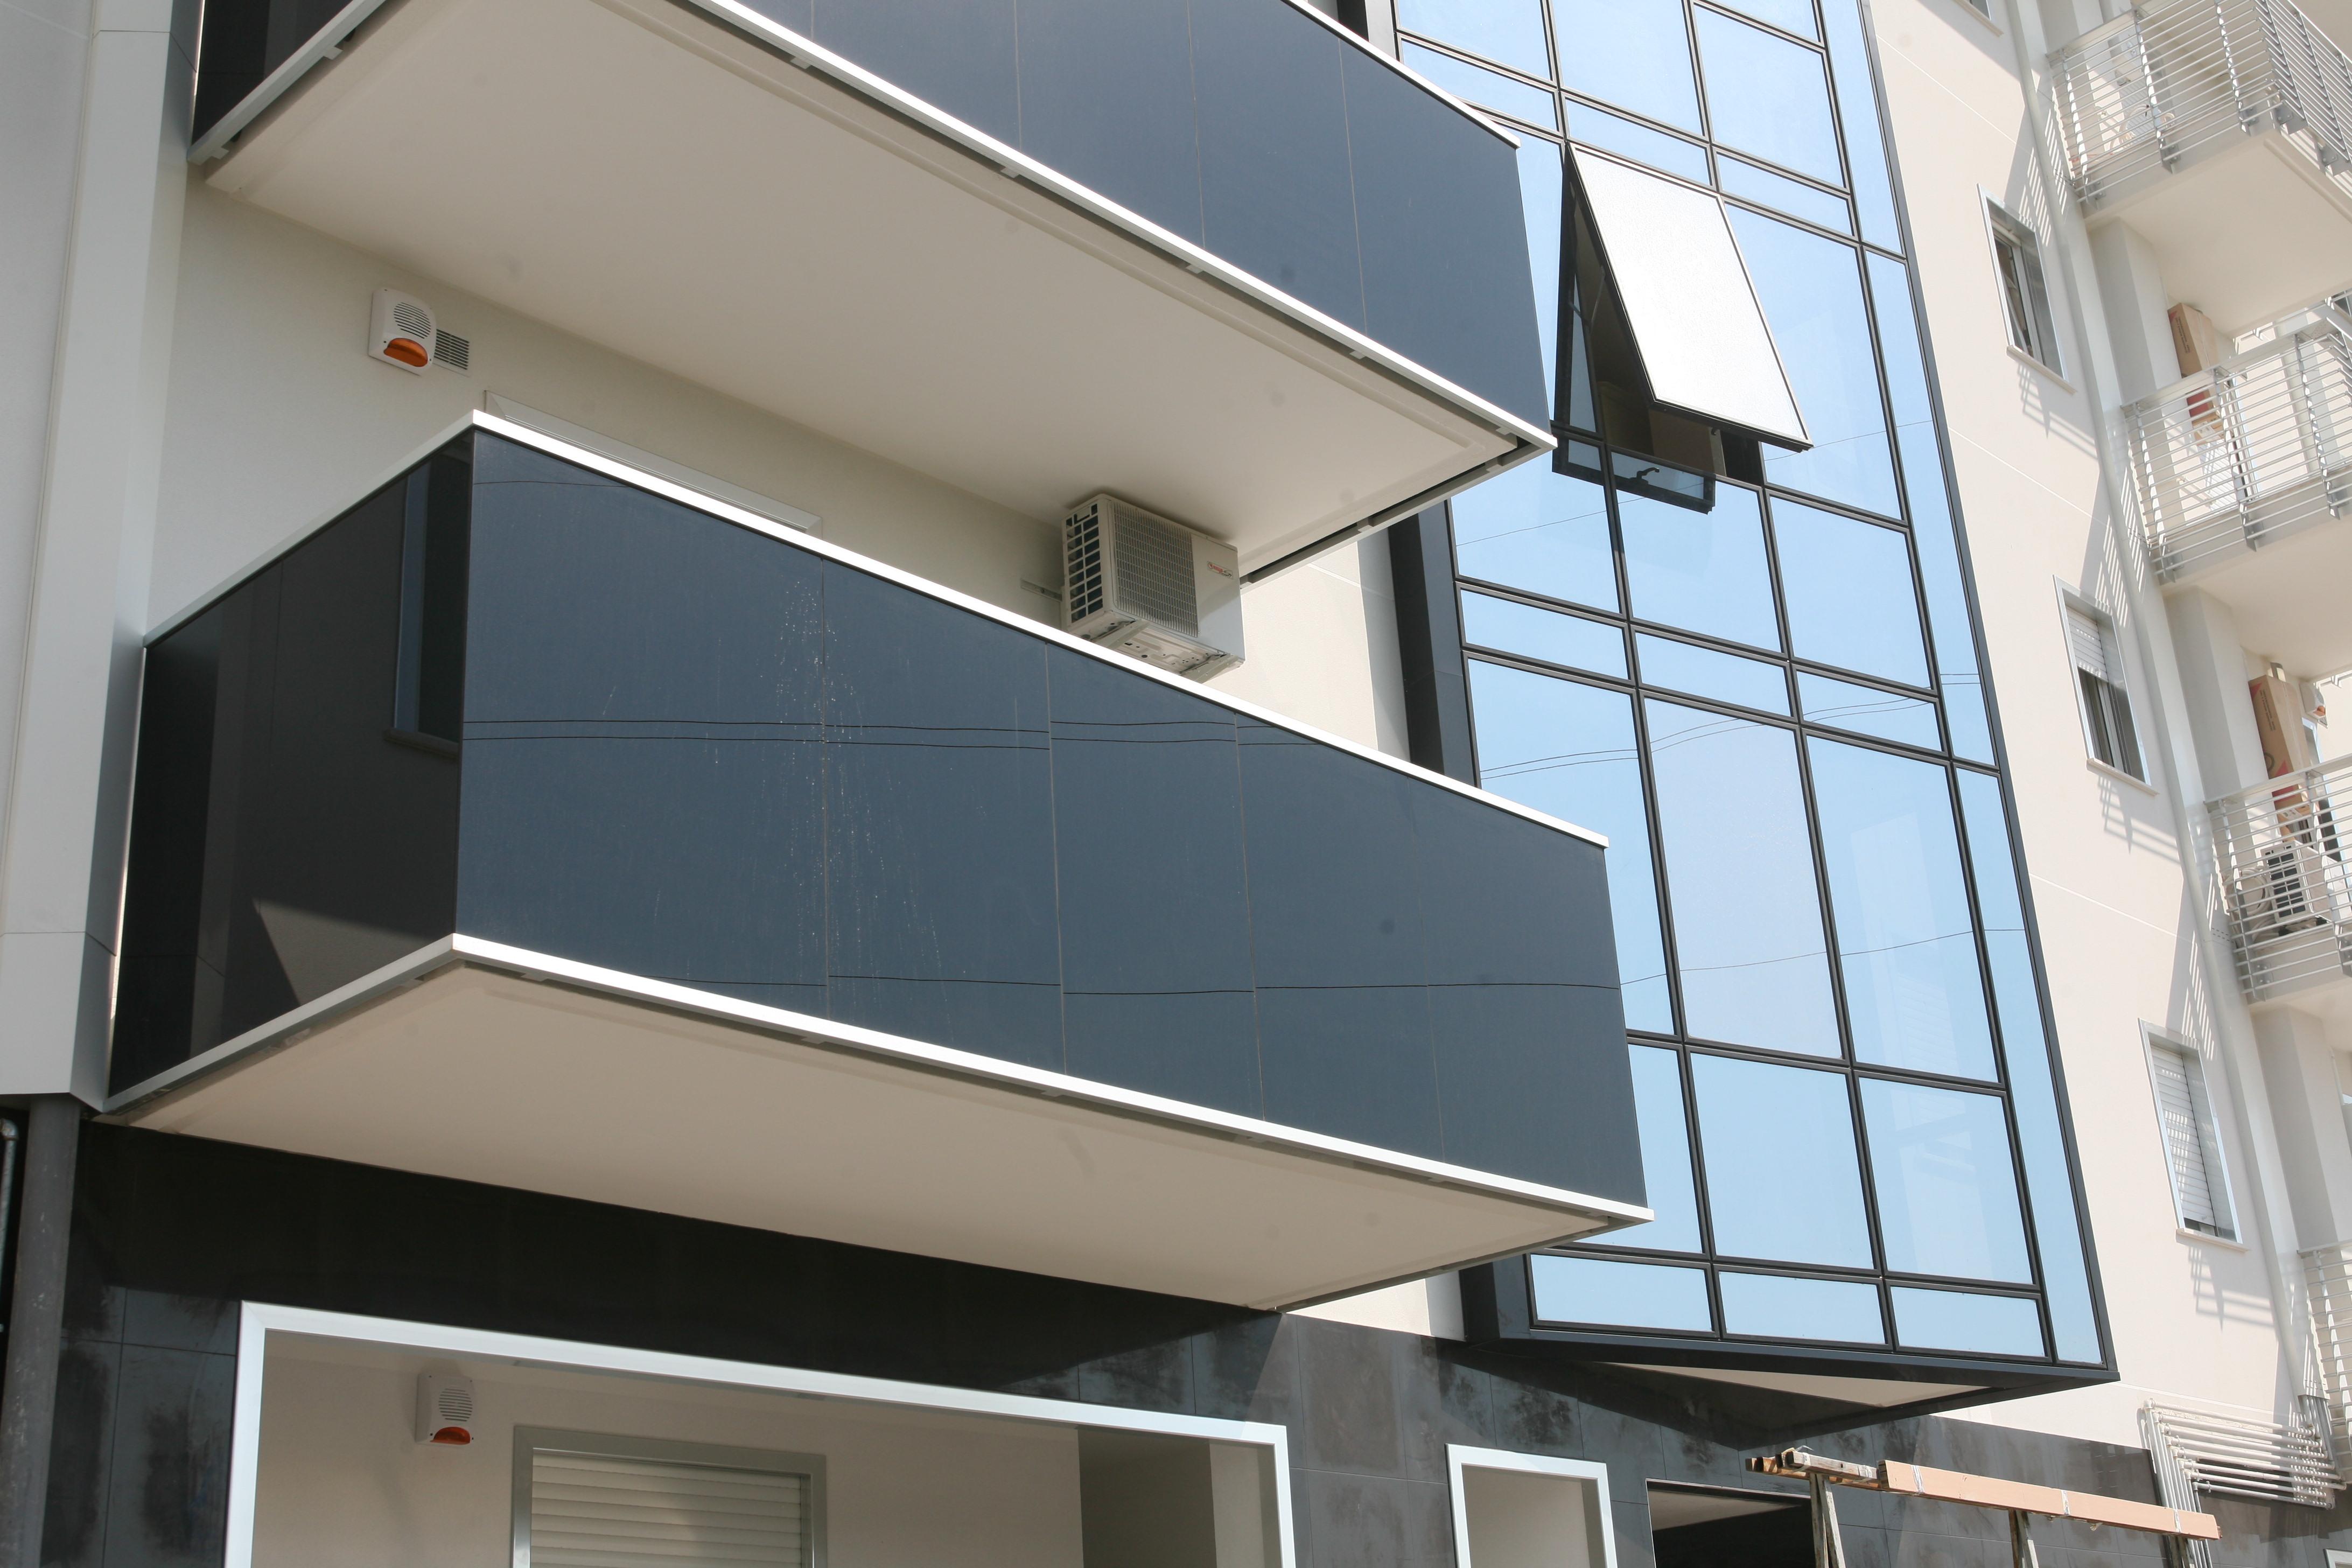 Ringhiere moderne simple ringhiere moderne modulari di - Ringhiere da interno moderne ...